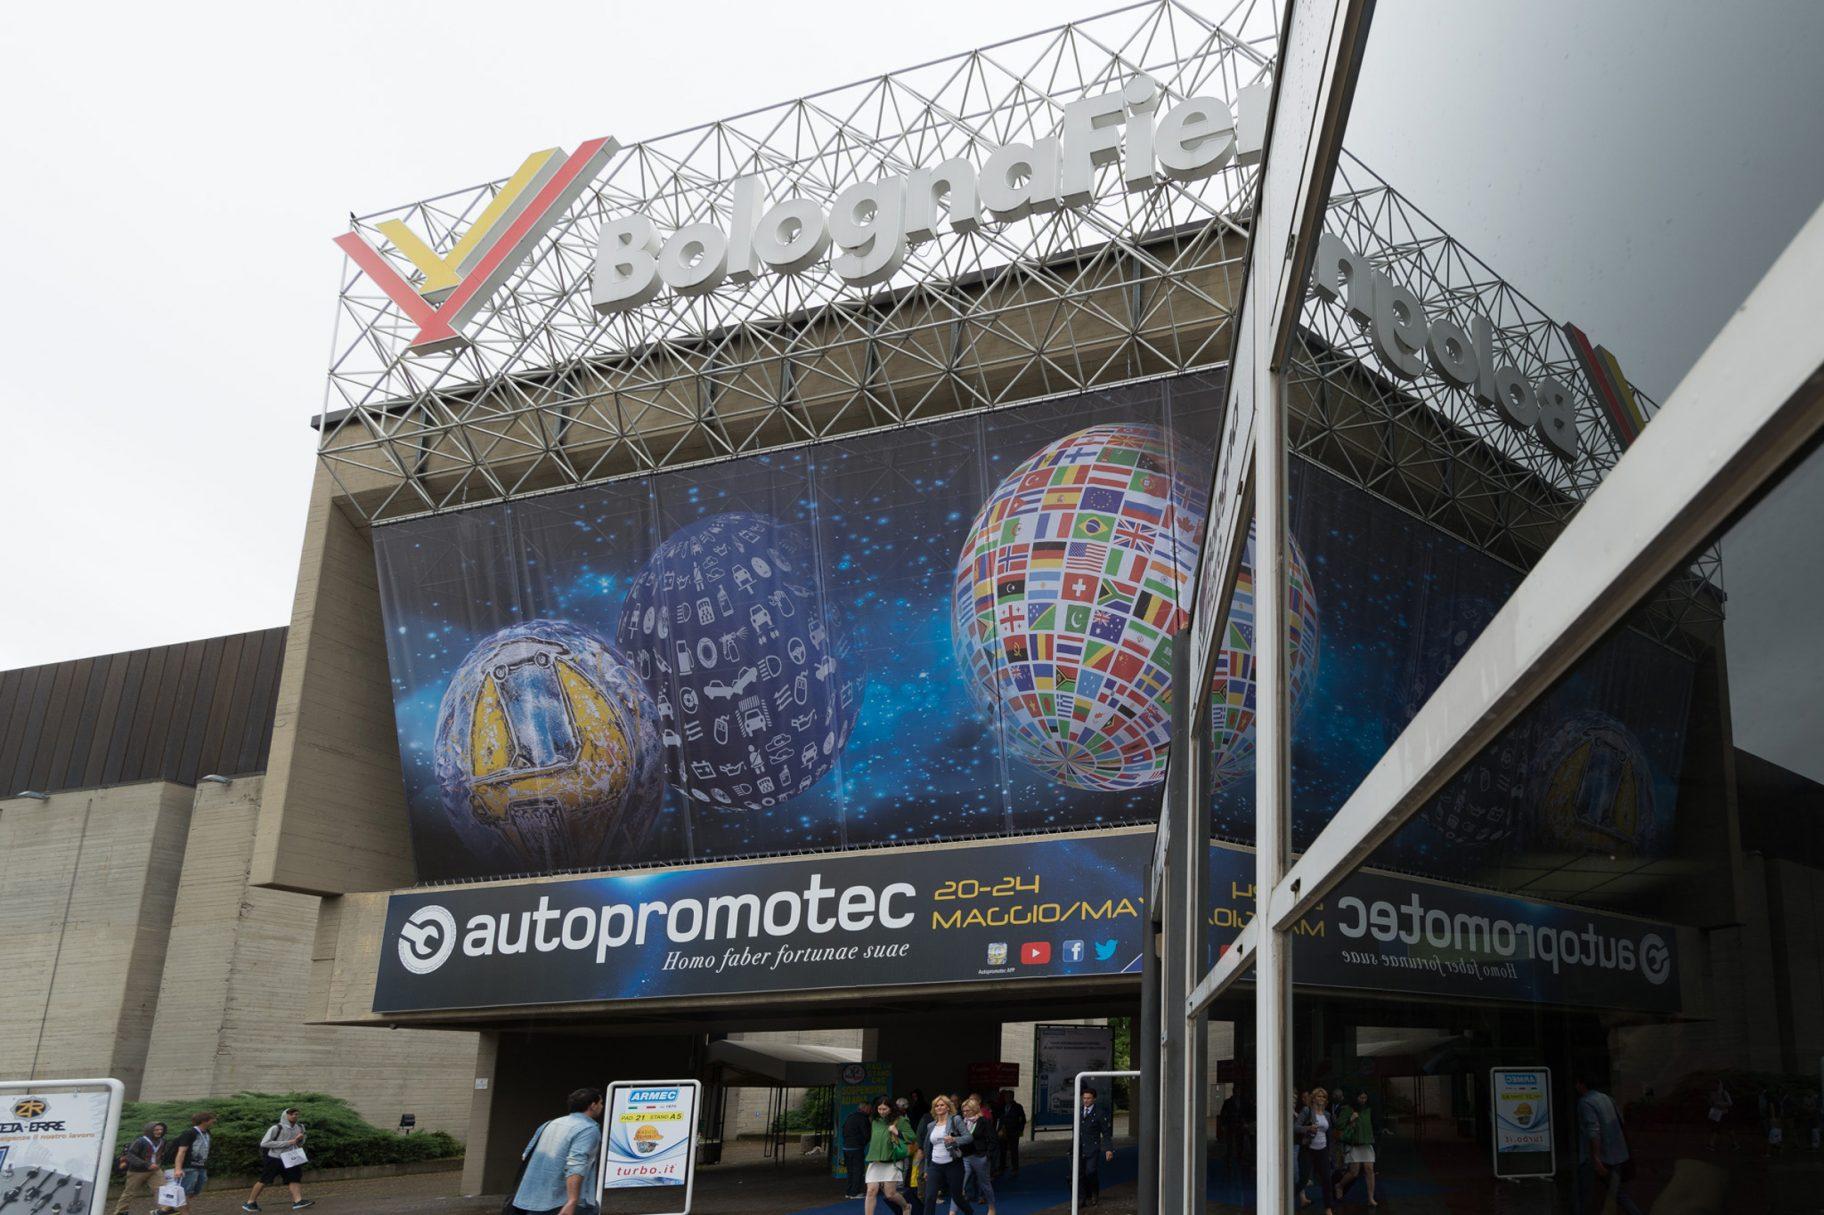 Autopromotec-fiera-2015-Entrata